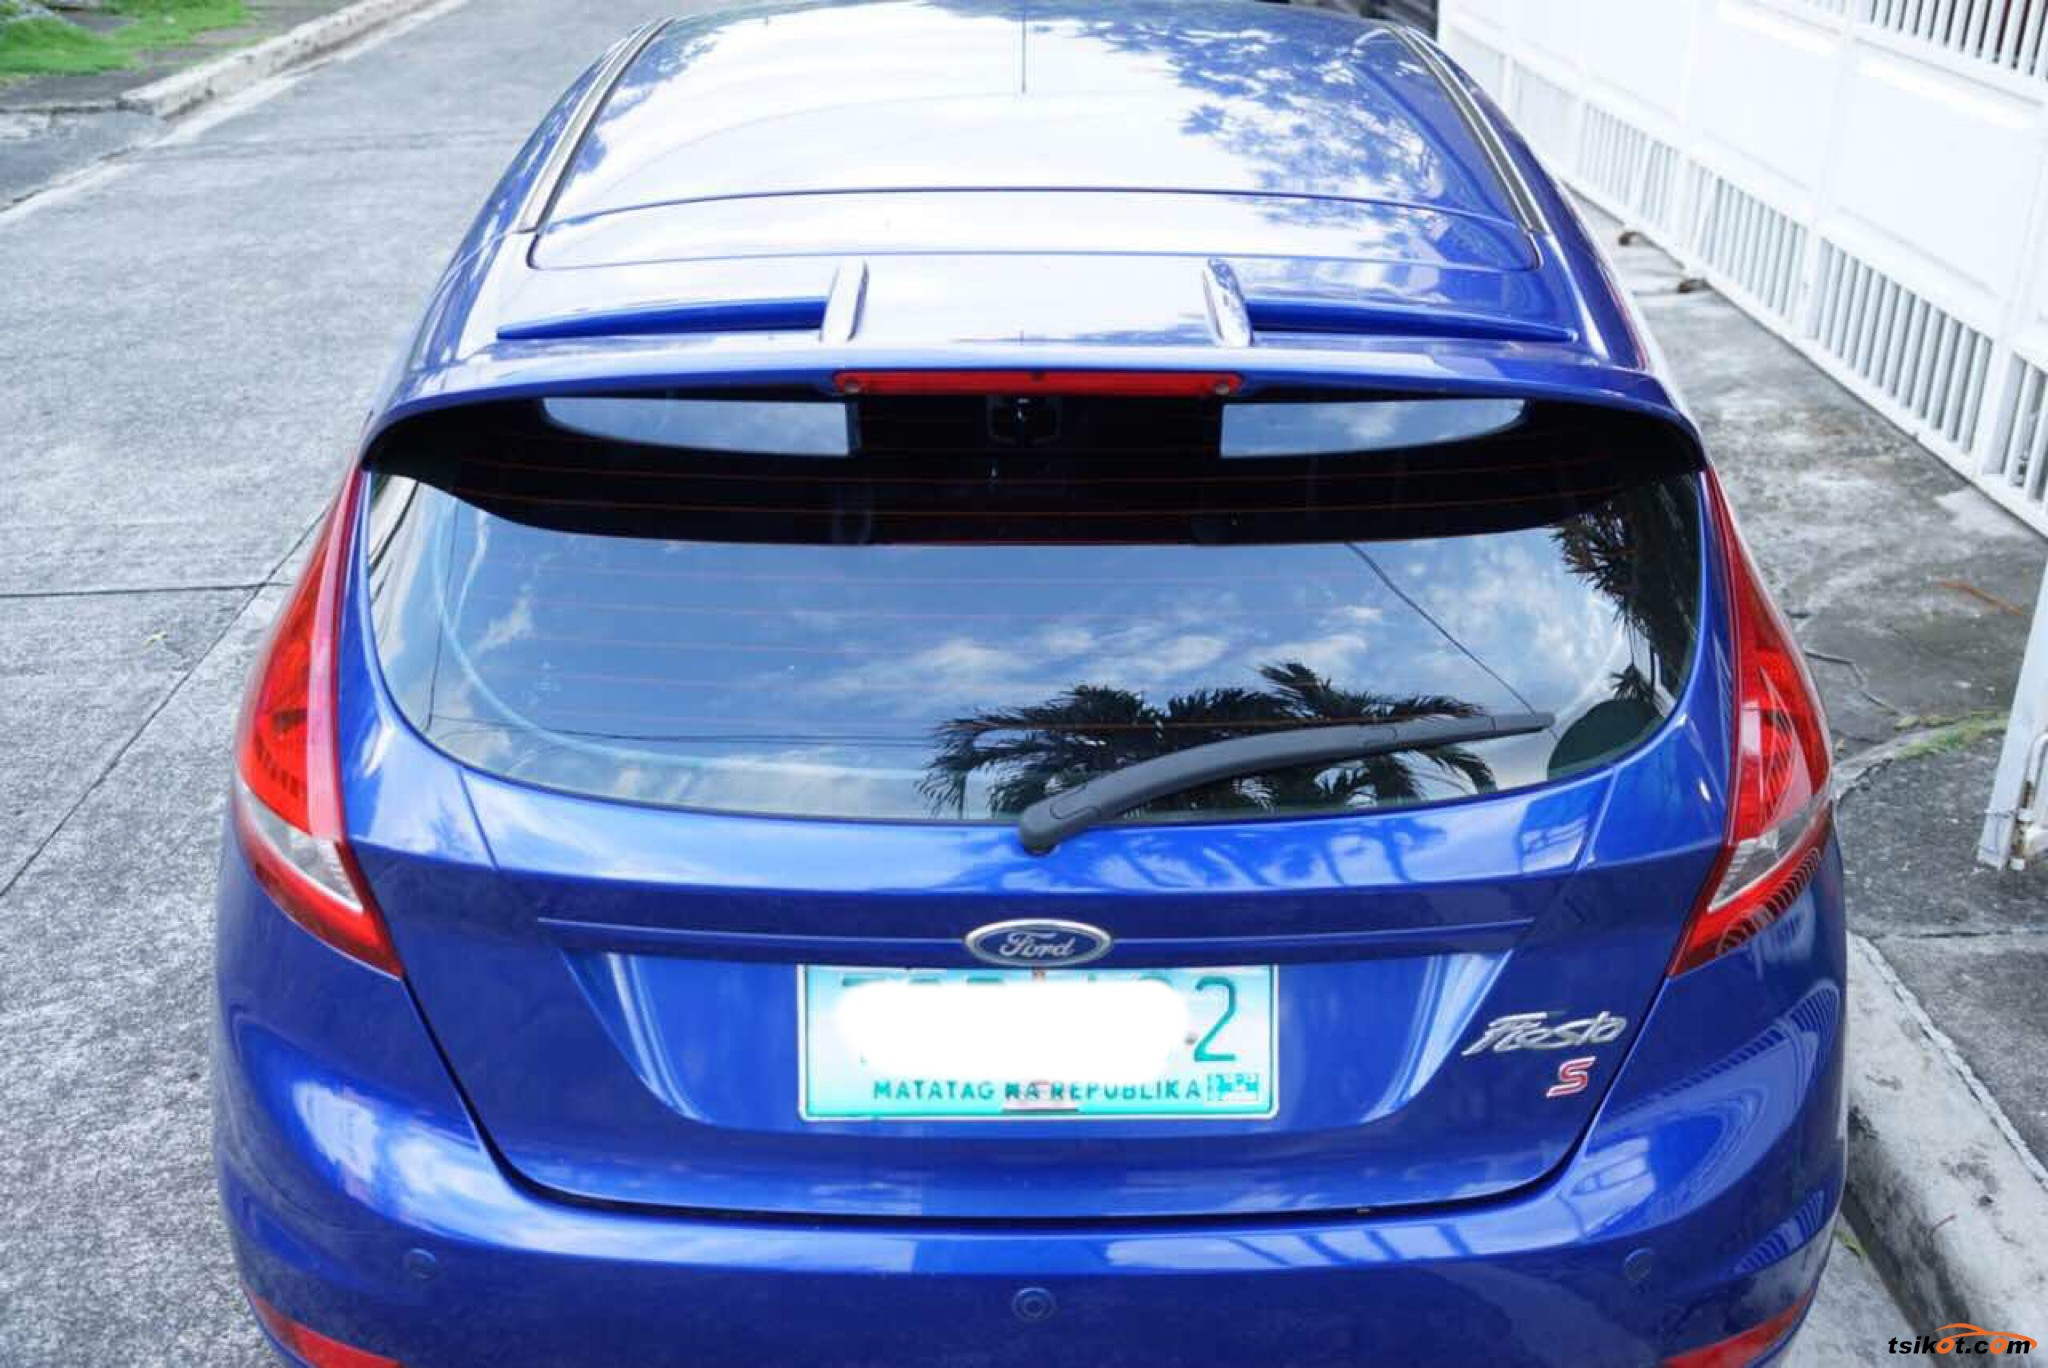 Ford Fiesta 2012 - 9